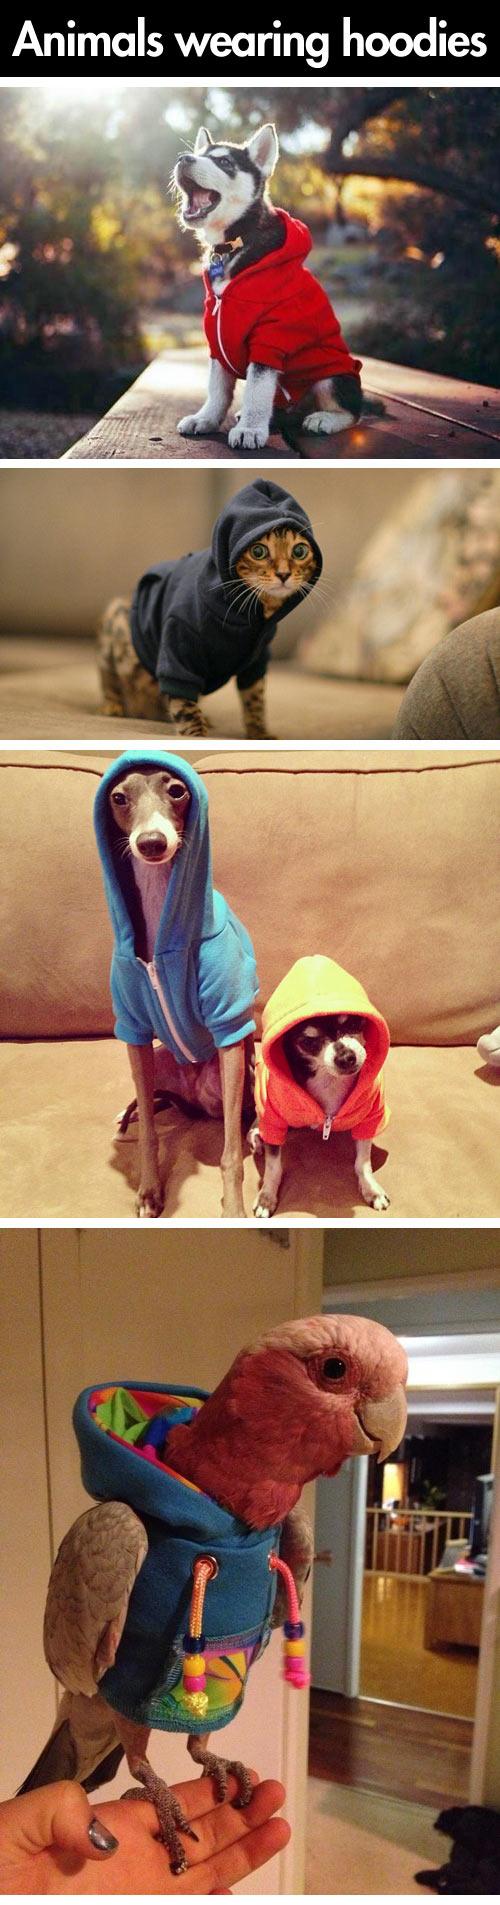 Cats wearing hoodies...